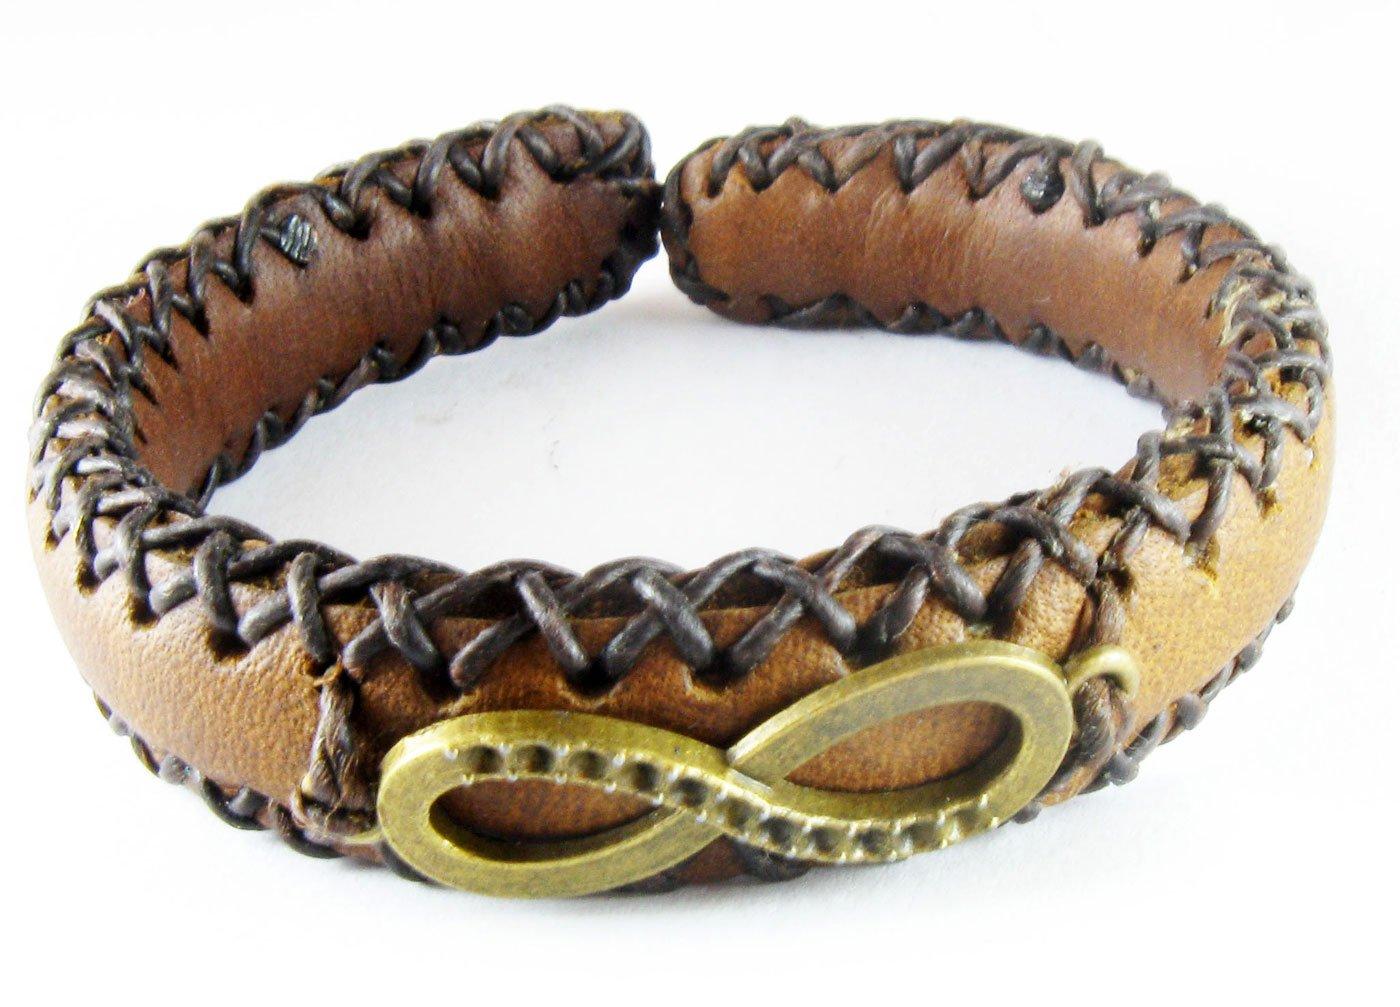 D'SHARK Handmade Infinity Design Biker Leather Bangle Bracelet Cuff Wristband for Unisex (Brown)